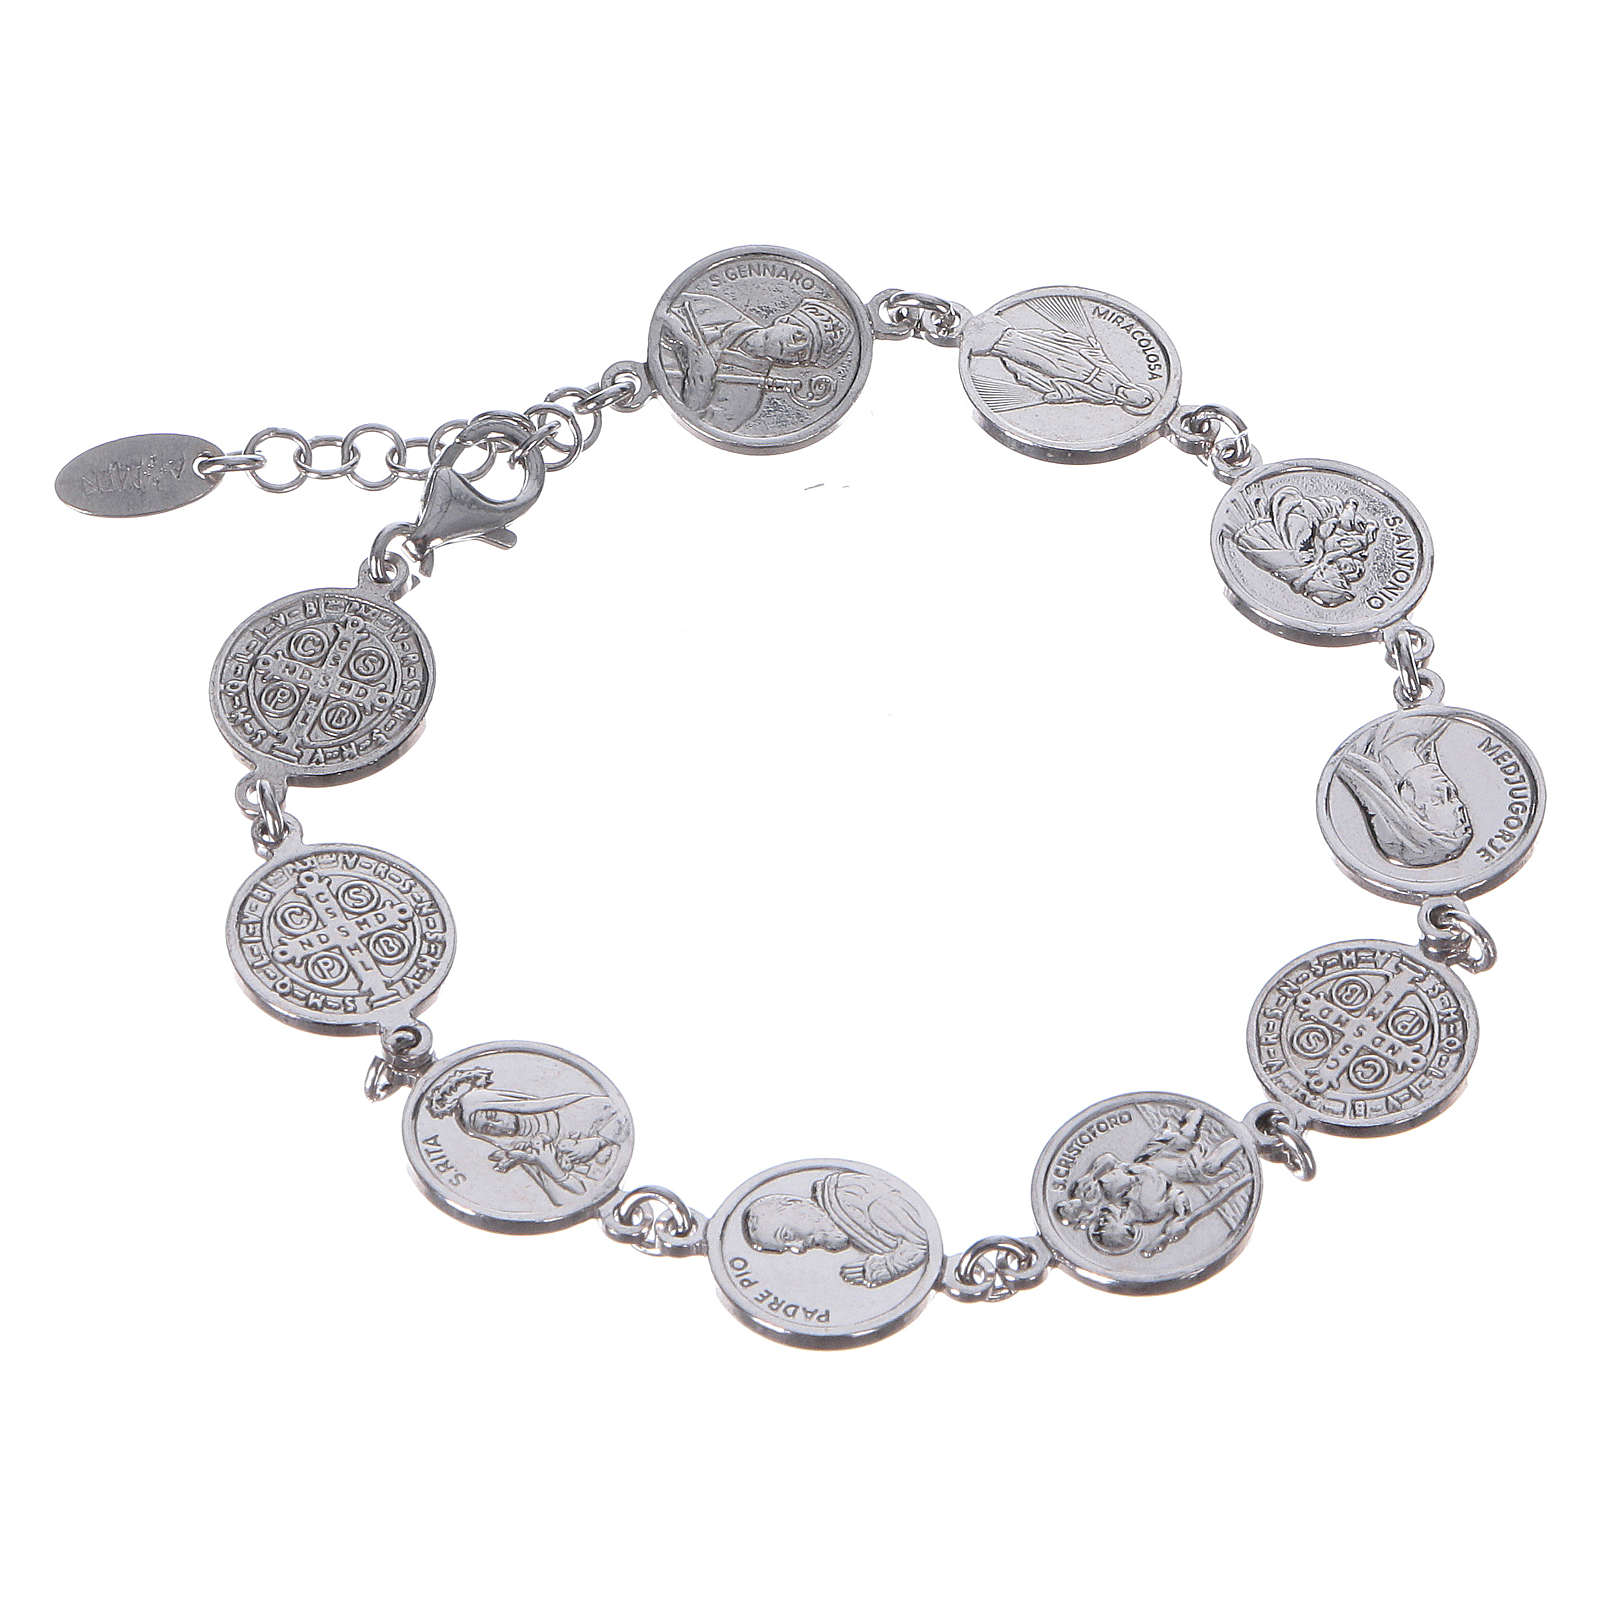 Amen bracelet with Saints medals in Sterling silver 4